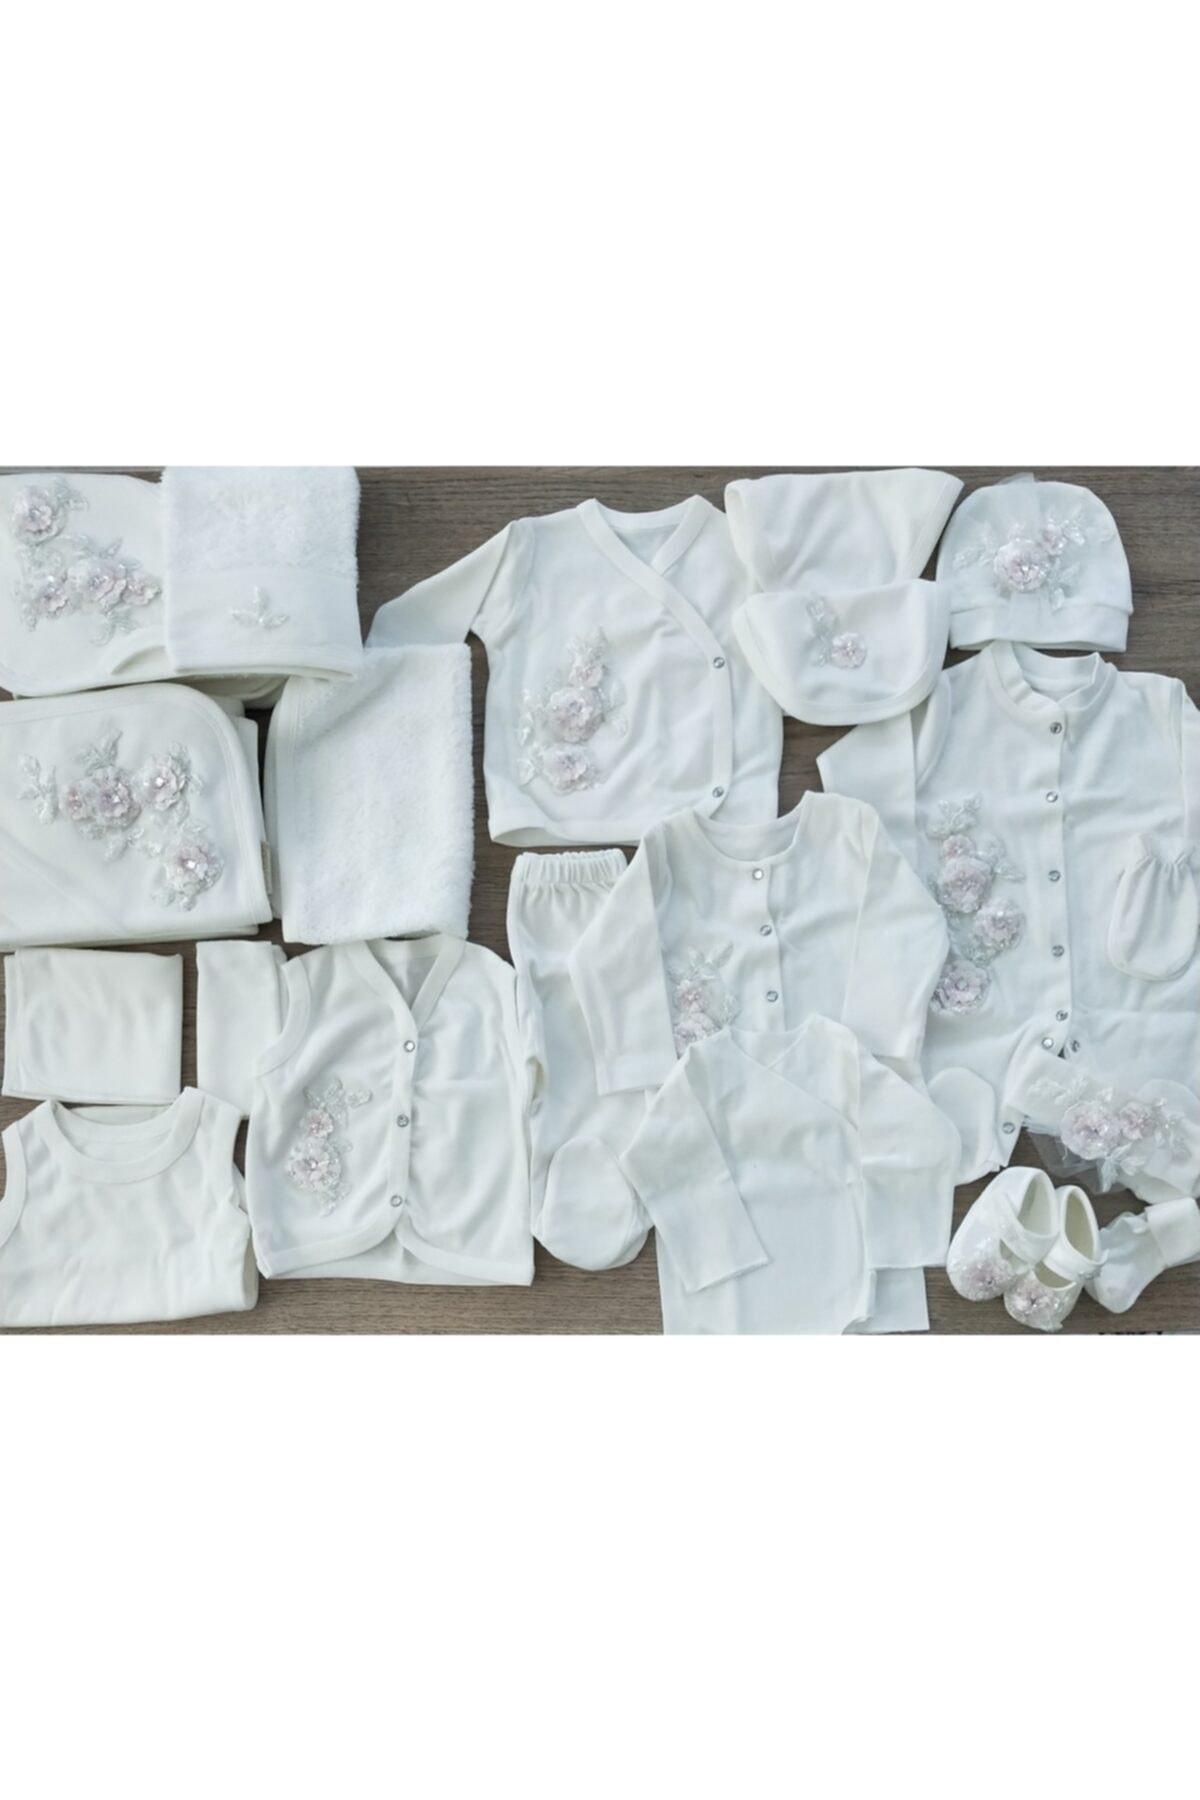 Eda Baby Kız Bebek Ithal Dantelli Pembe Çiçekli 20'li Hastane Çıkış Seti 2